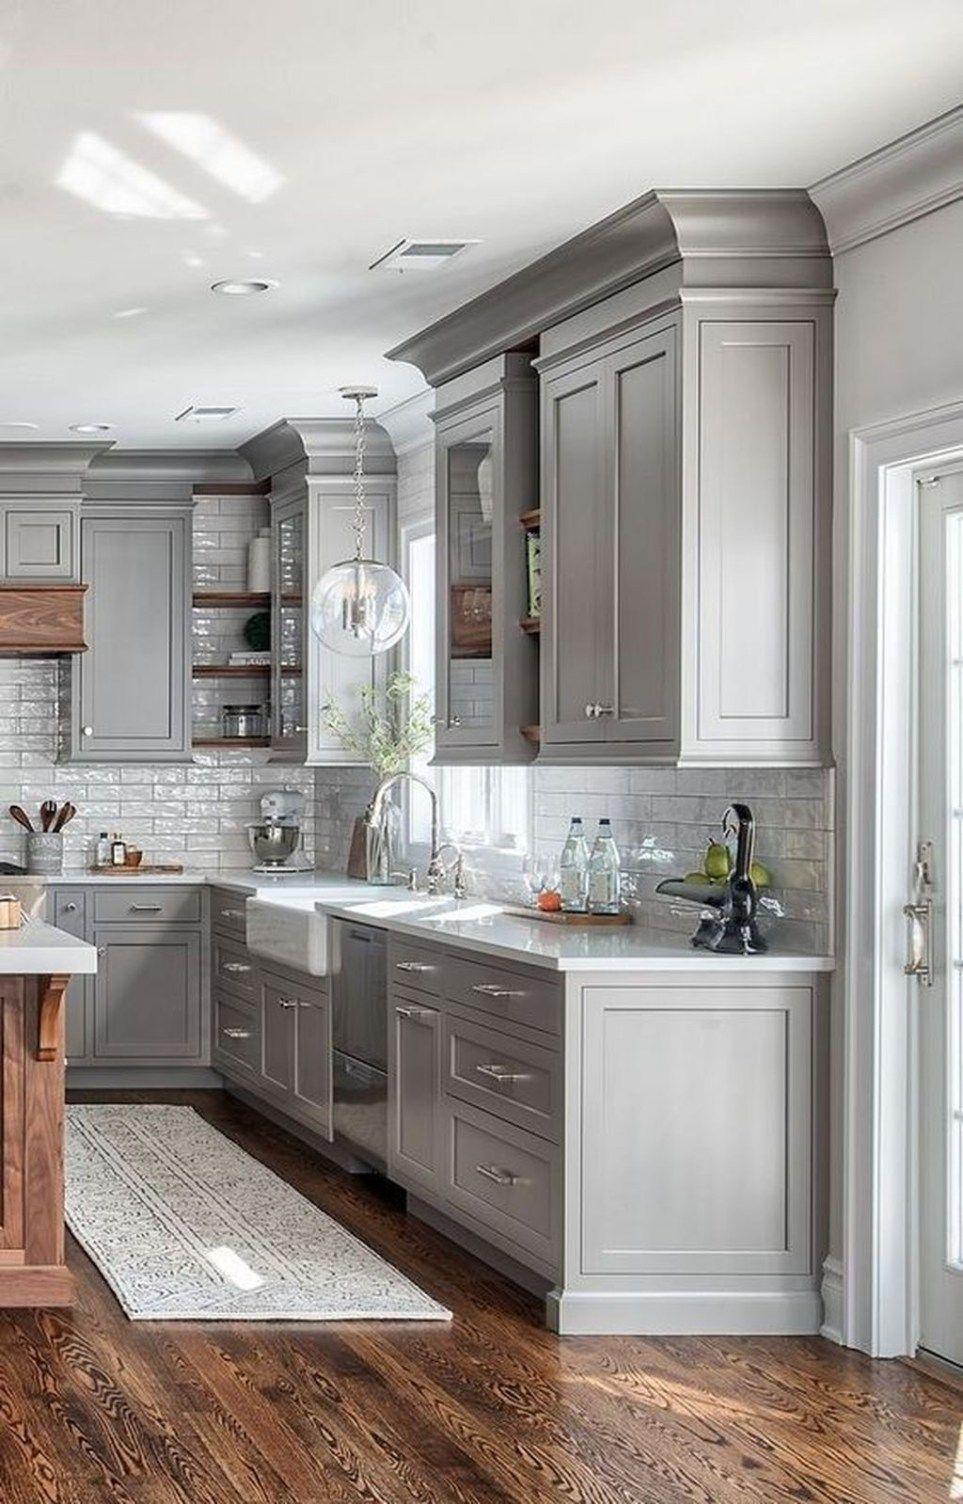 34 Luxury Farmhouse Kitchen Design Ideas To Bring Modern Look #topkitchendesigns